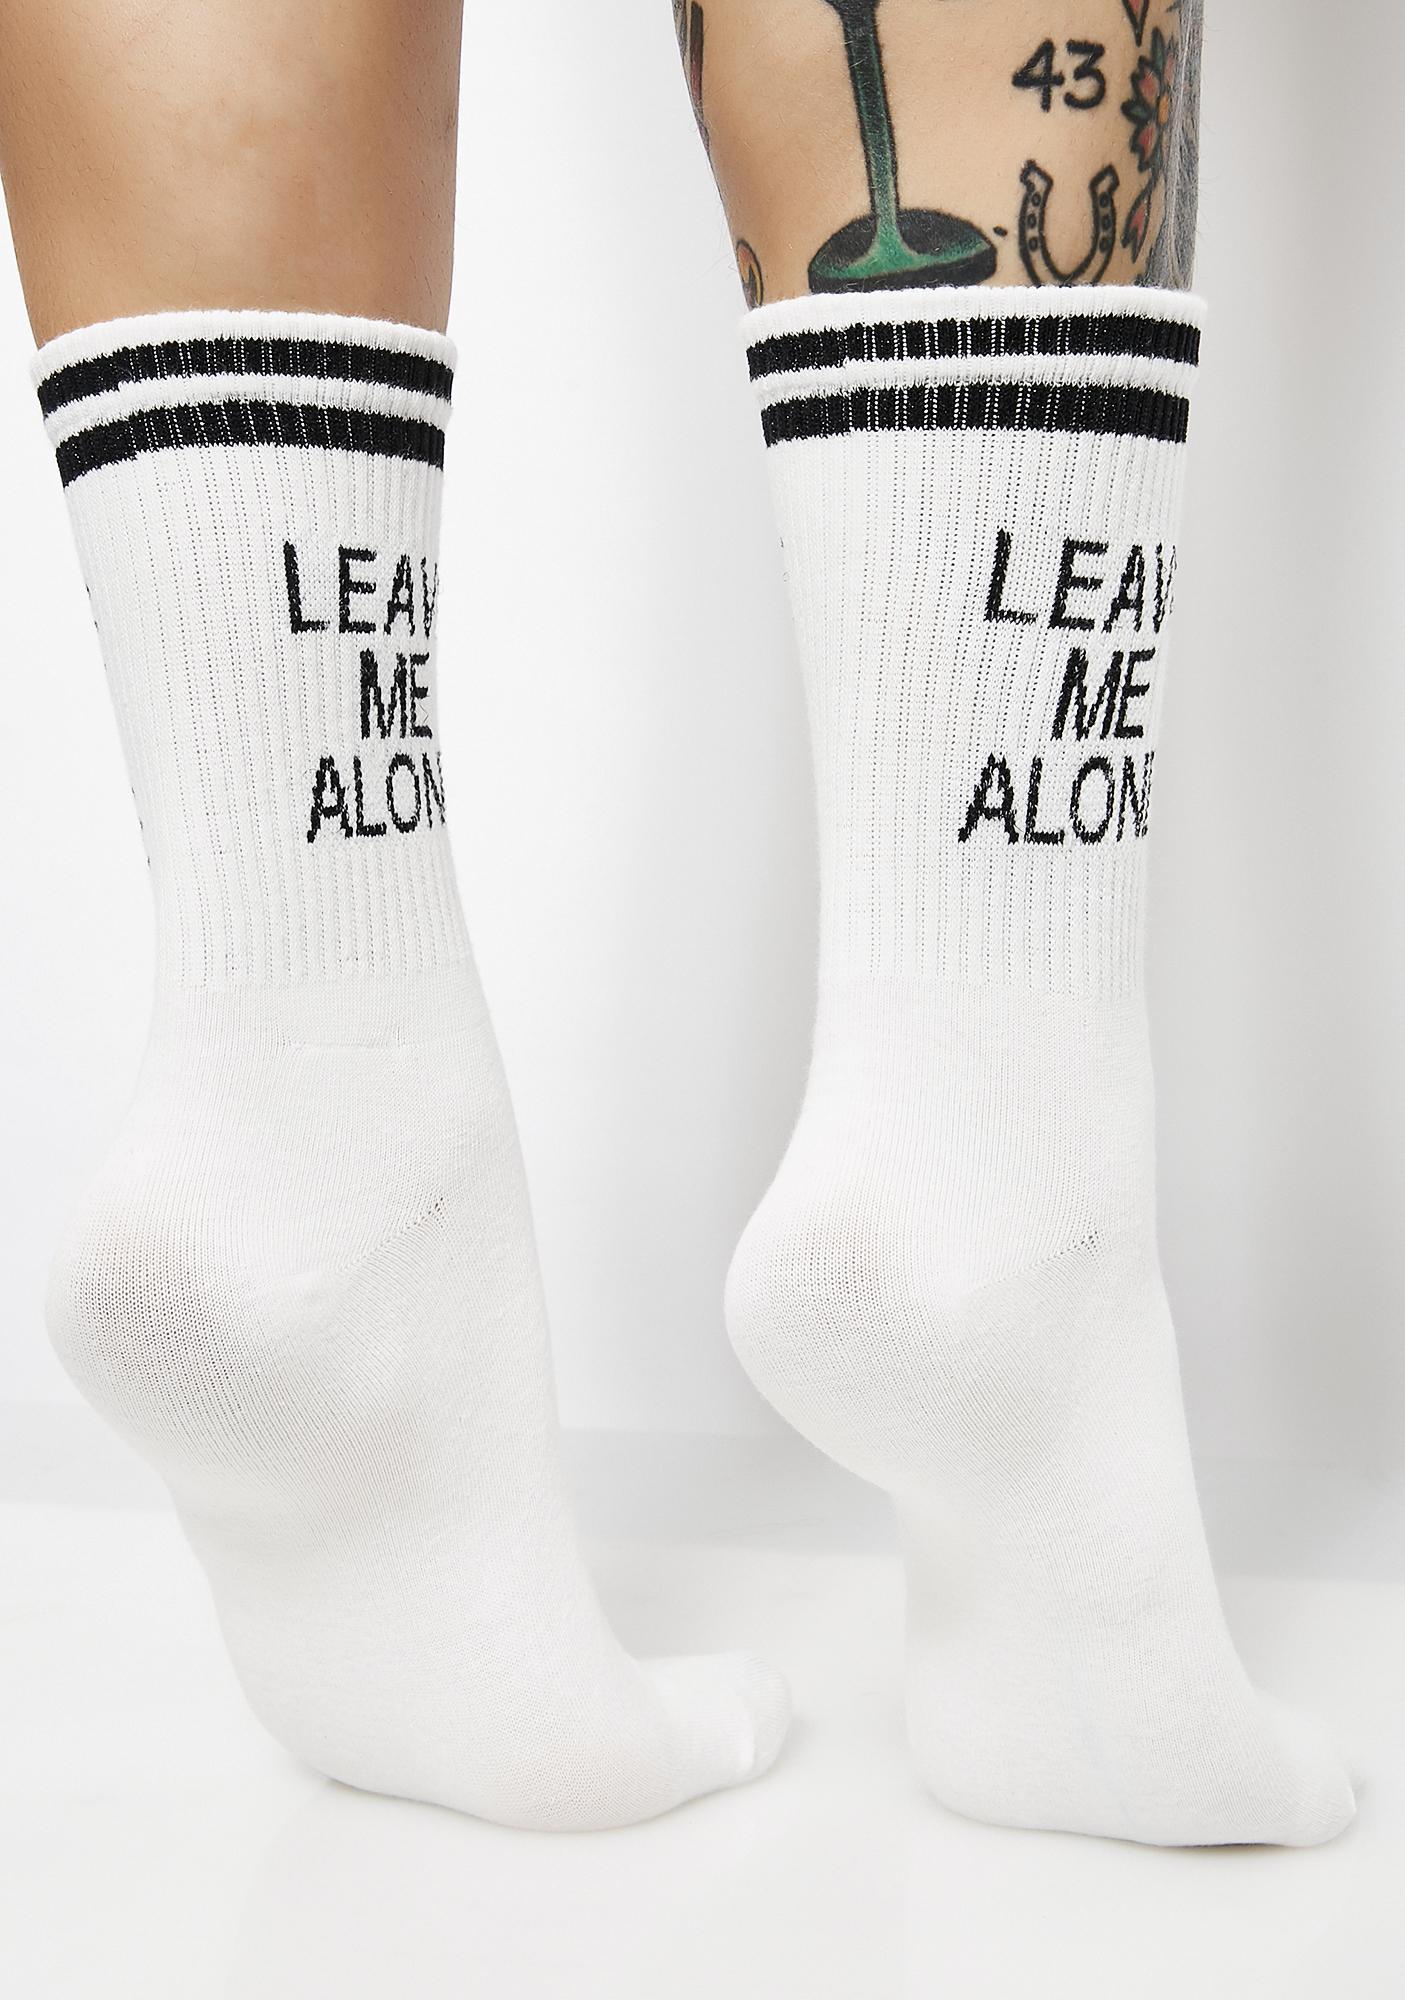 Leave Me Alone Socks